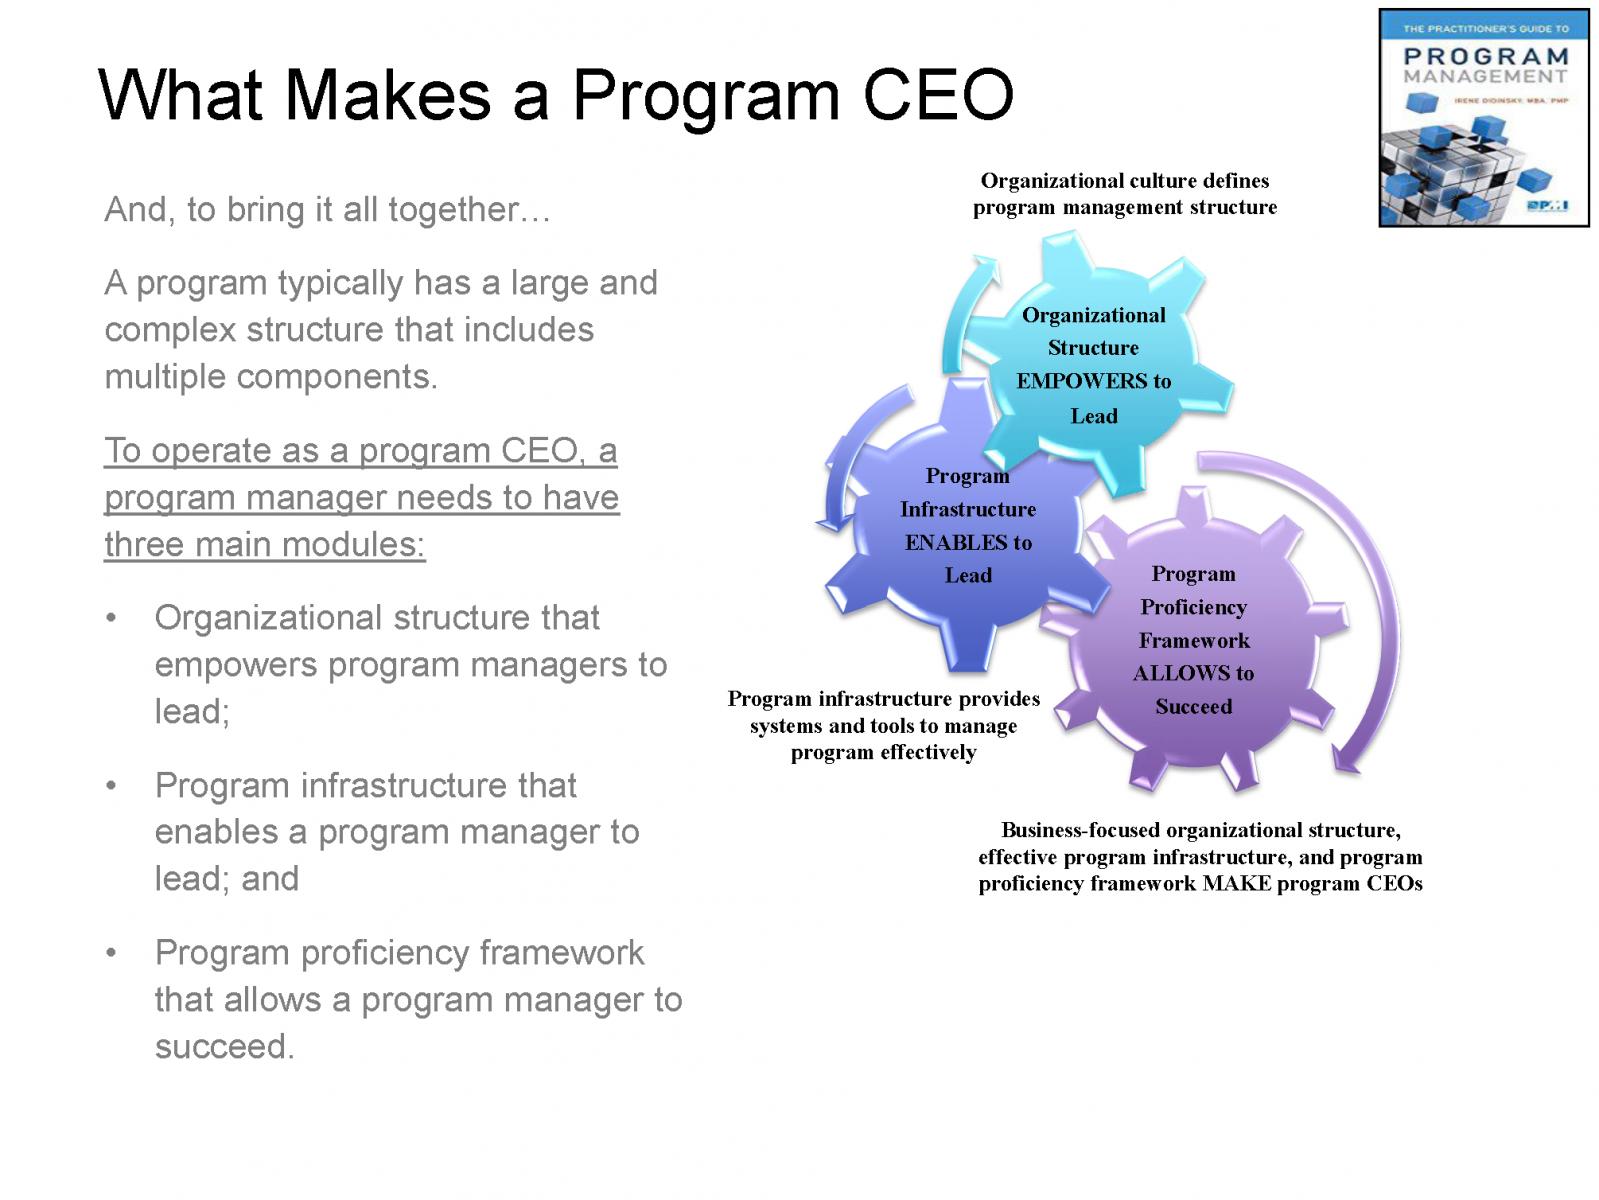 ProjectManagementcom webinar_Irene Didinsky_03282018_v01 (1)_Page_13